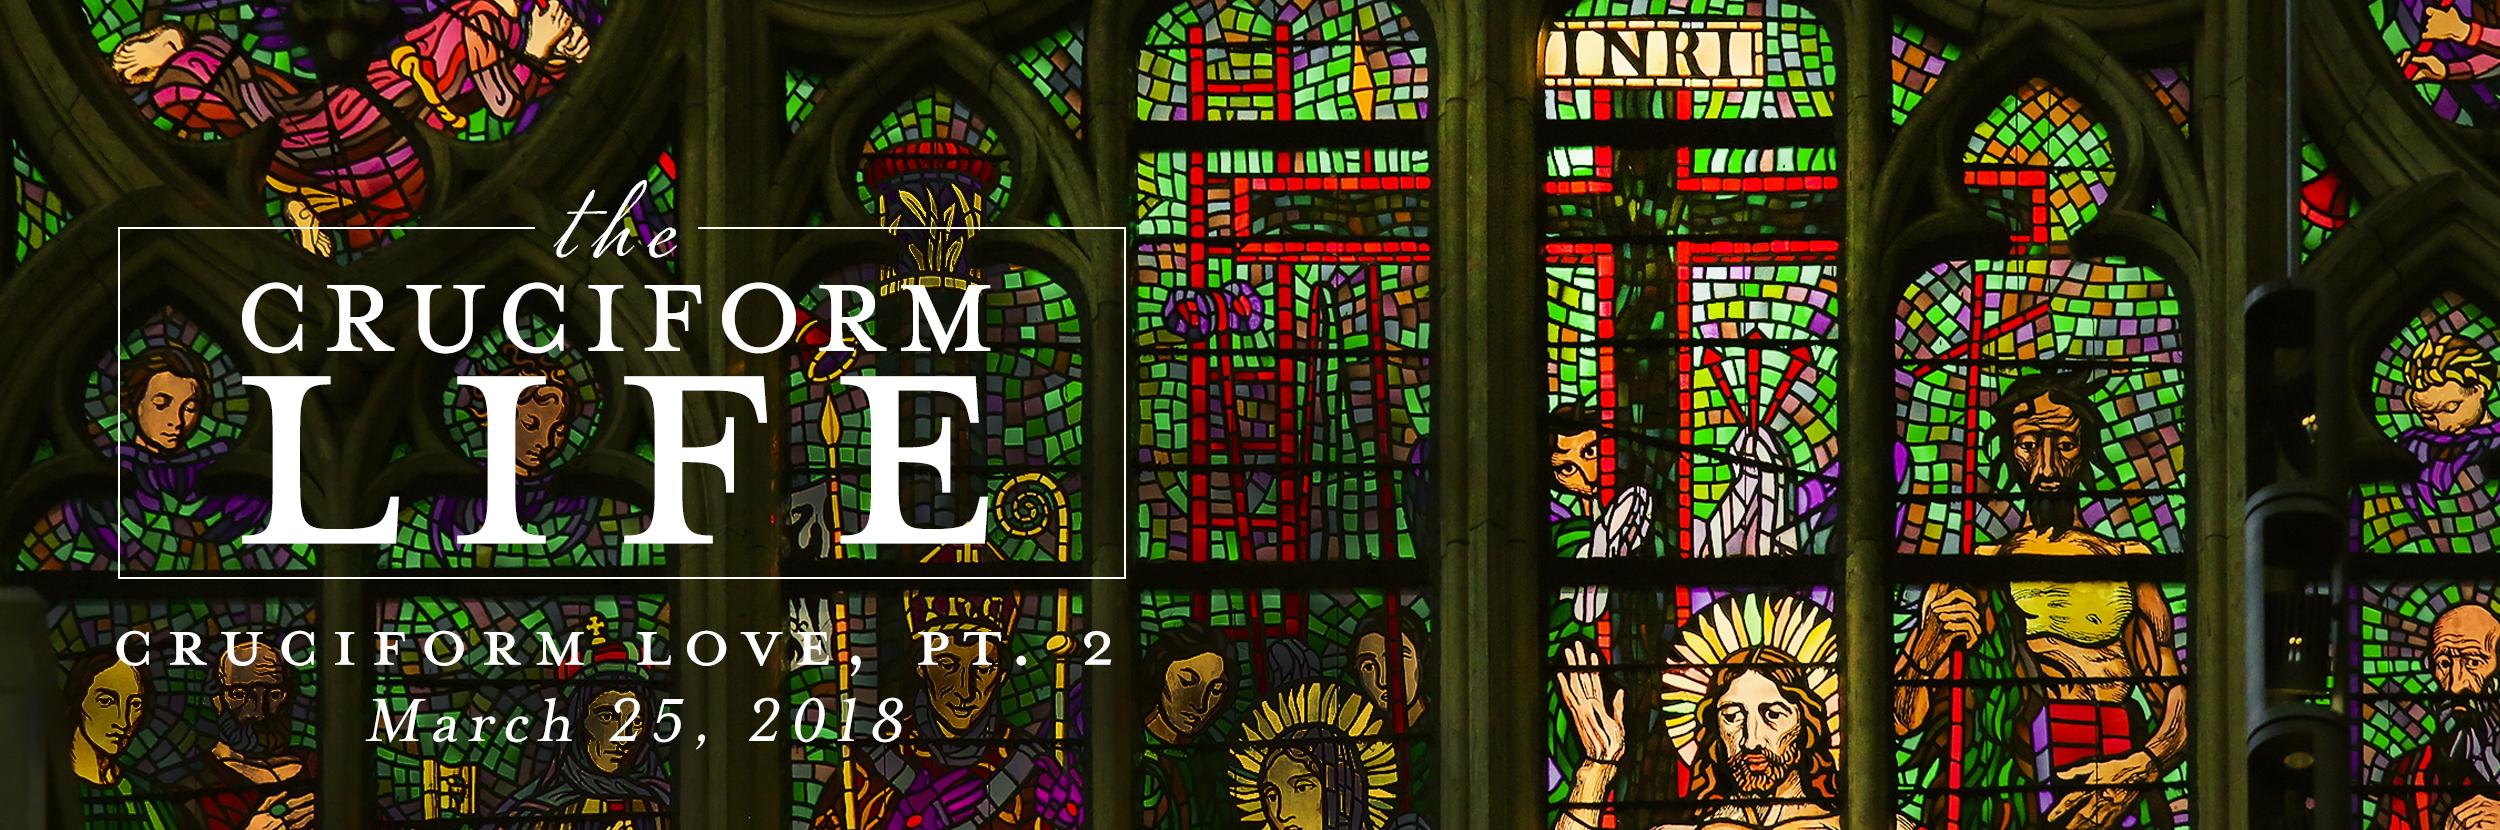 8. Cruciform Life_Love Banner2.jpg